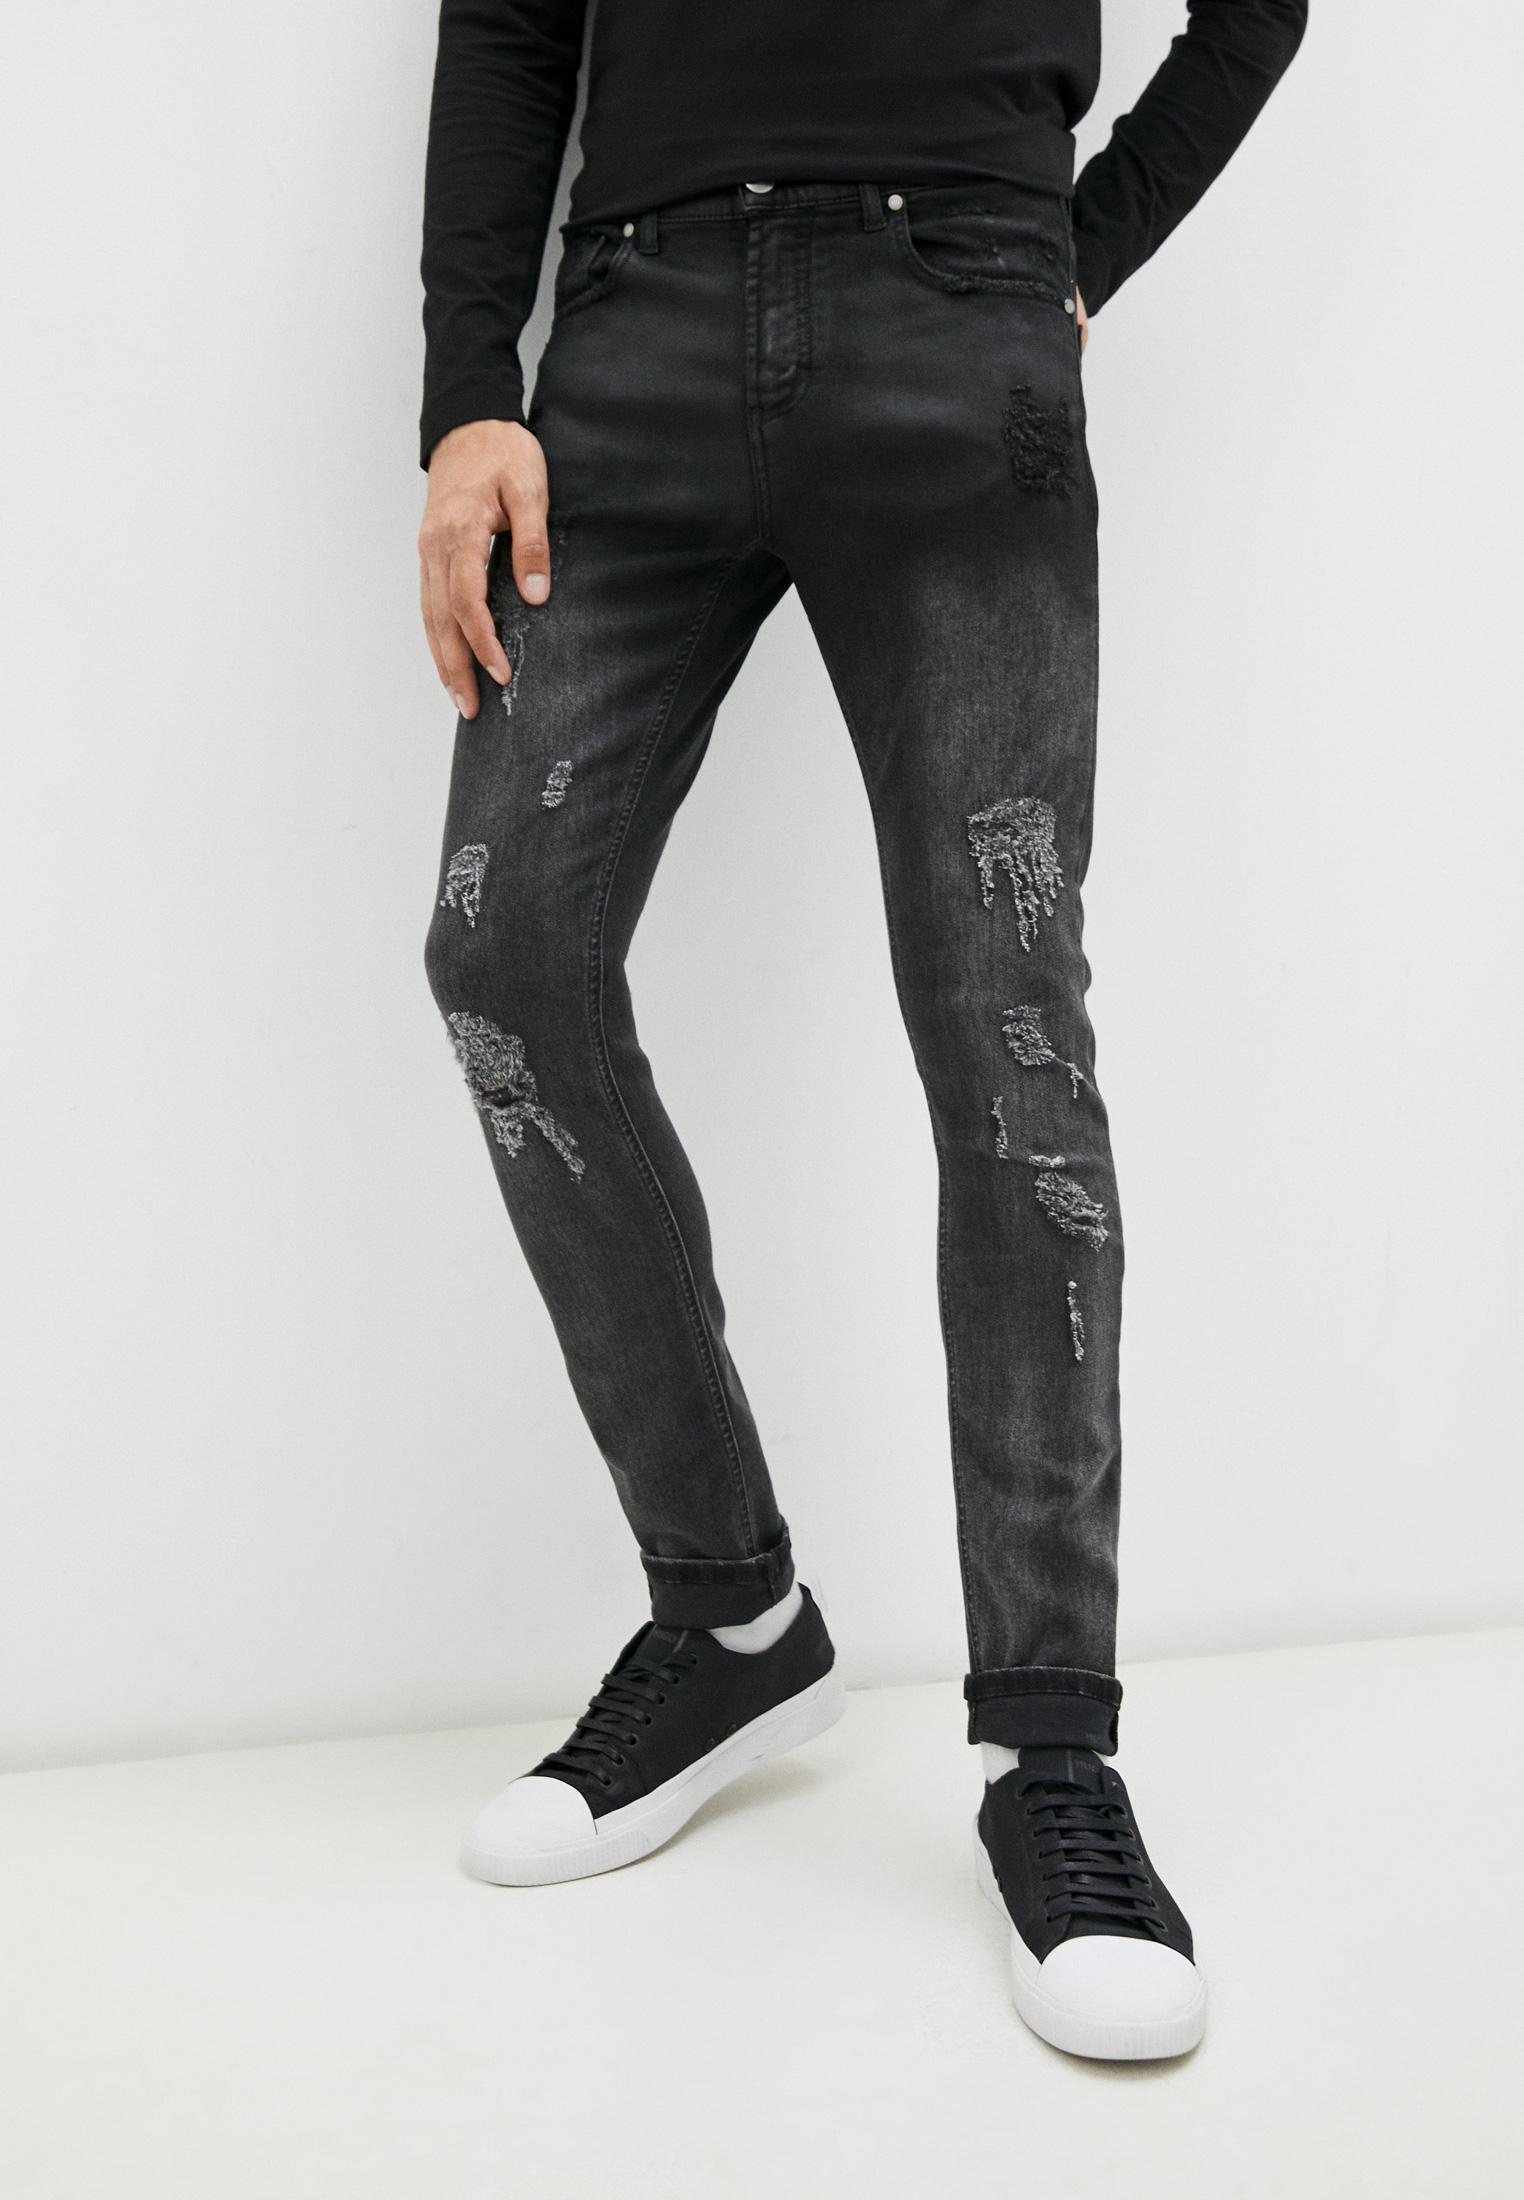 Мужские зауженные джинсы Bikkembergs (Биккембергс) C Q 001 85 S 2927